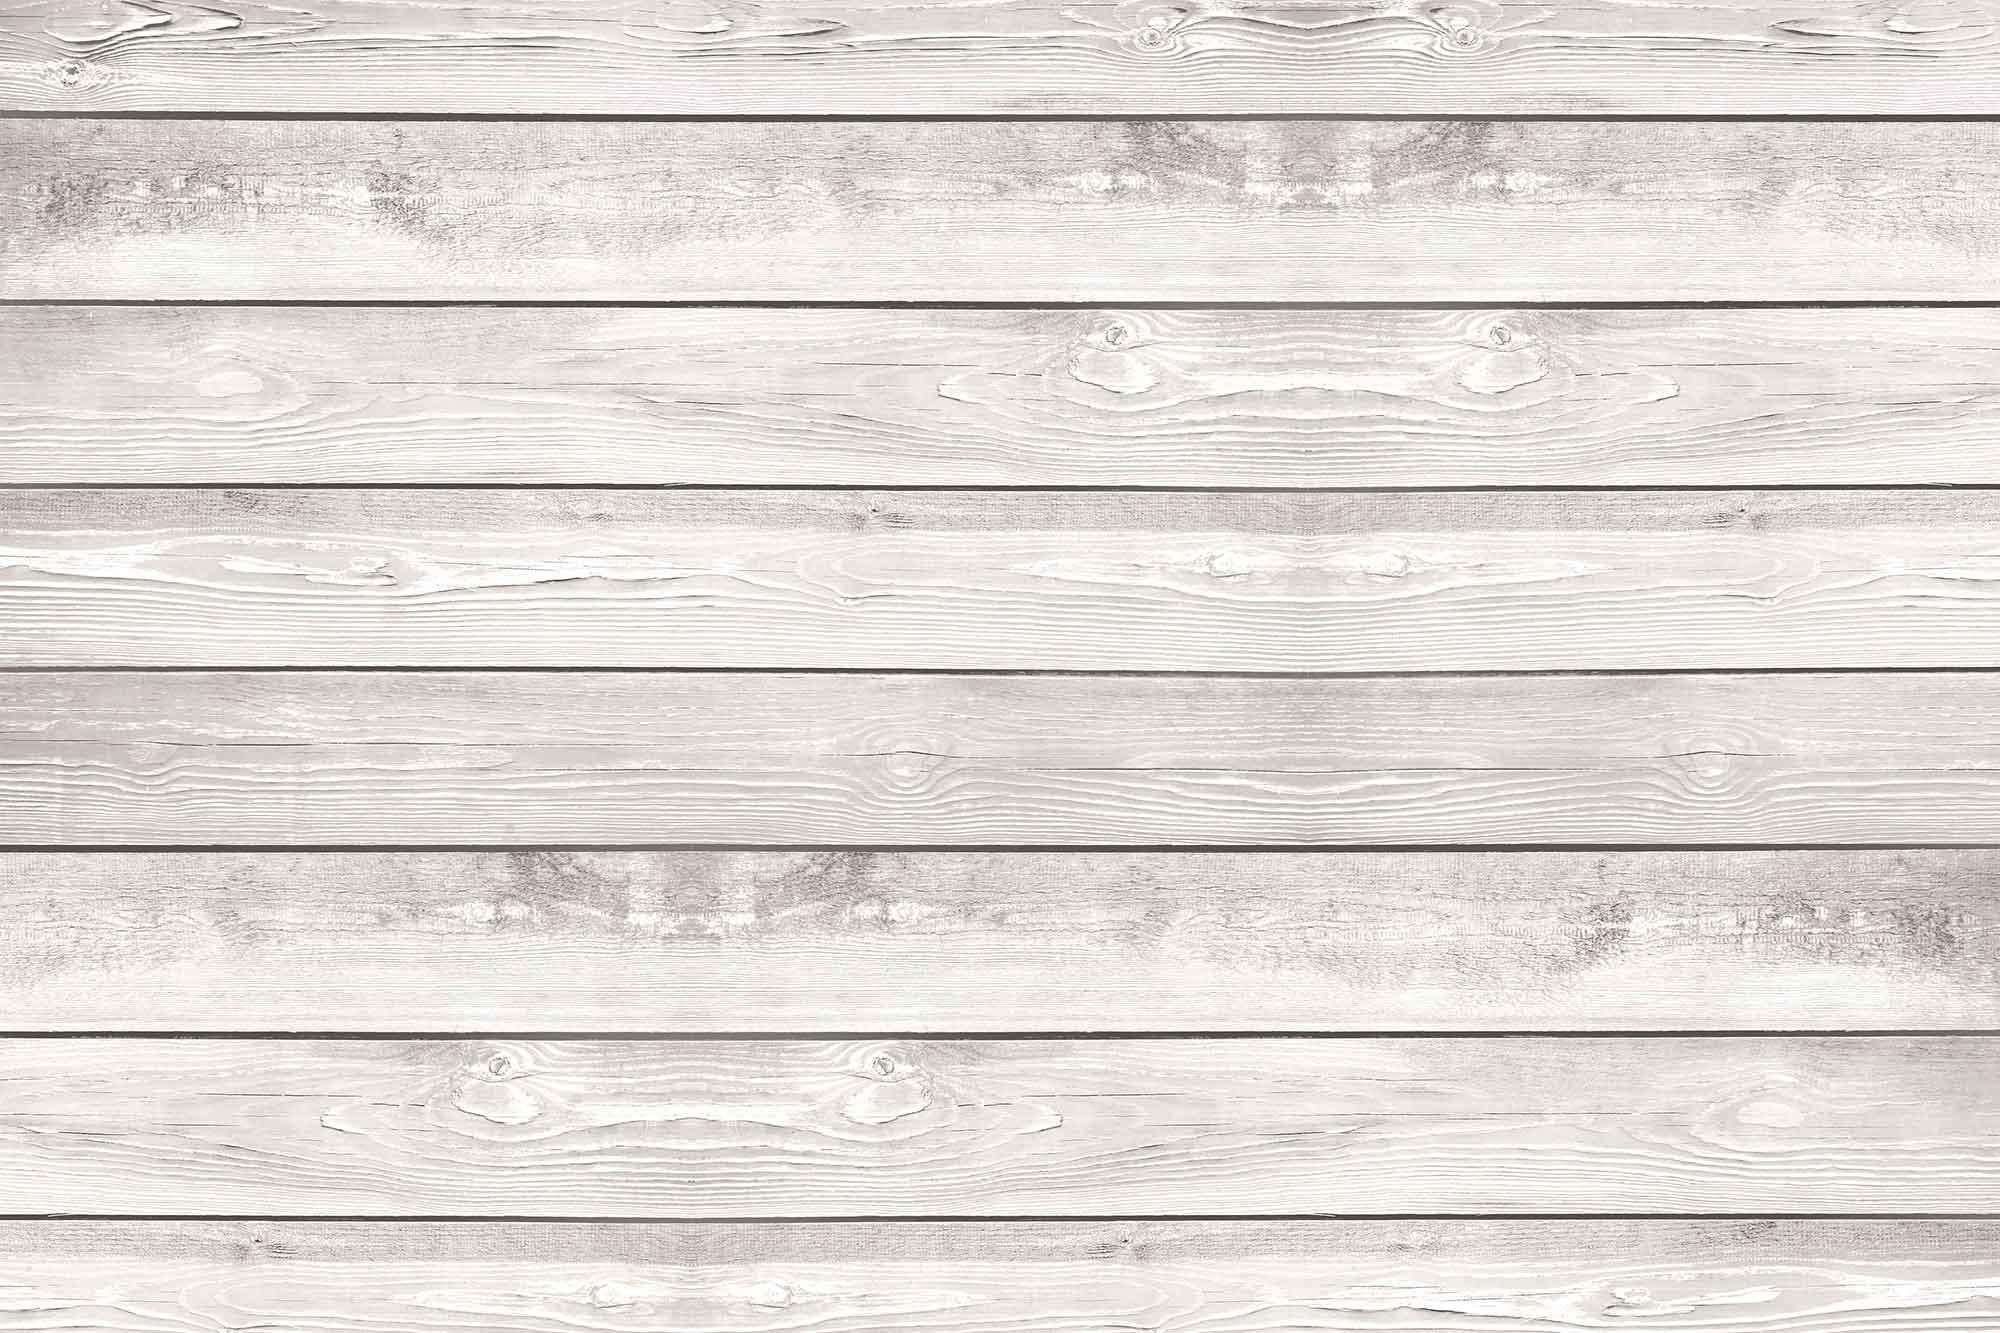 Light Wood Background Texture 1